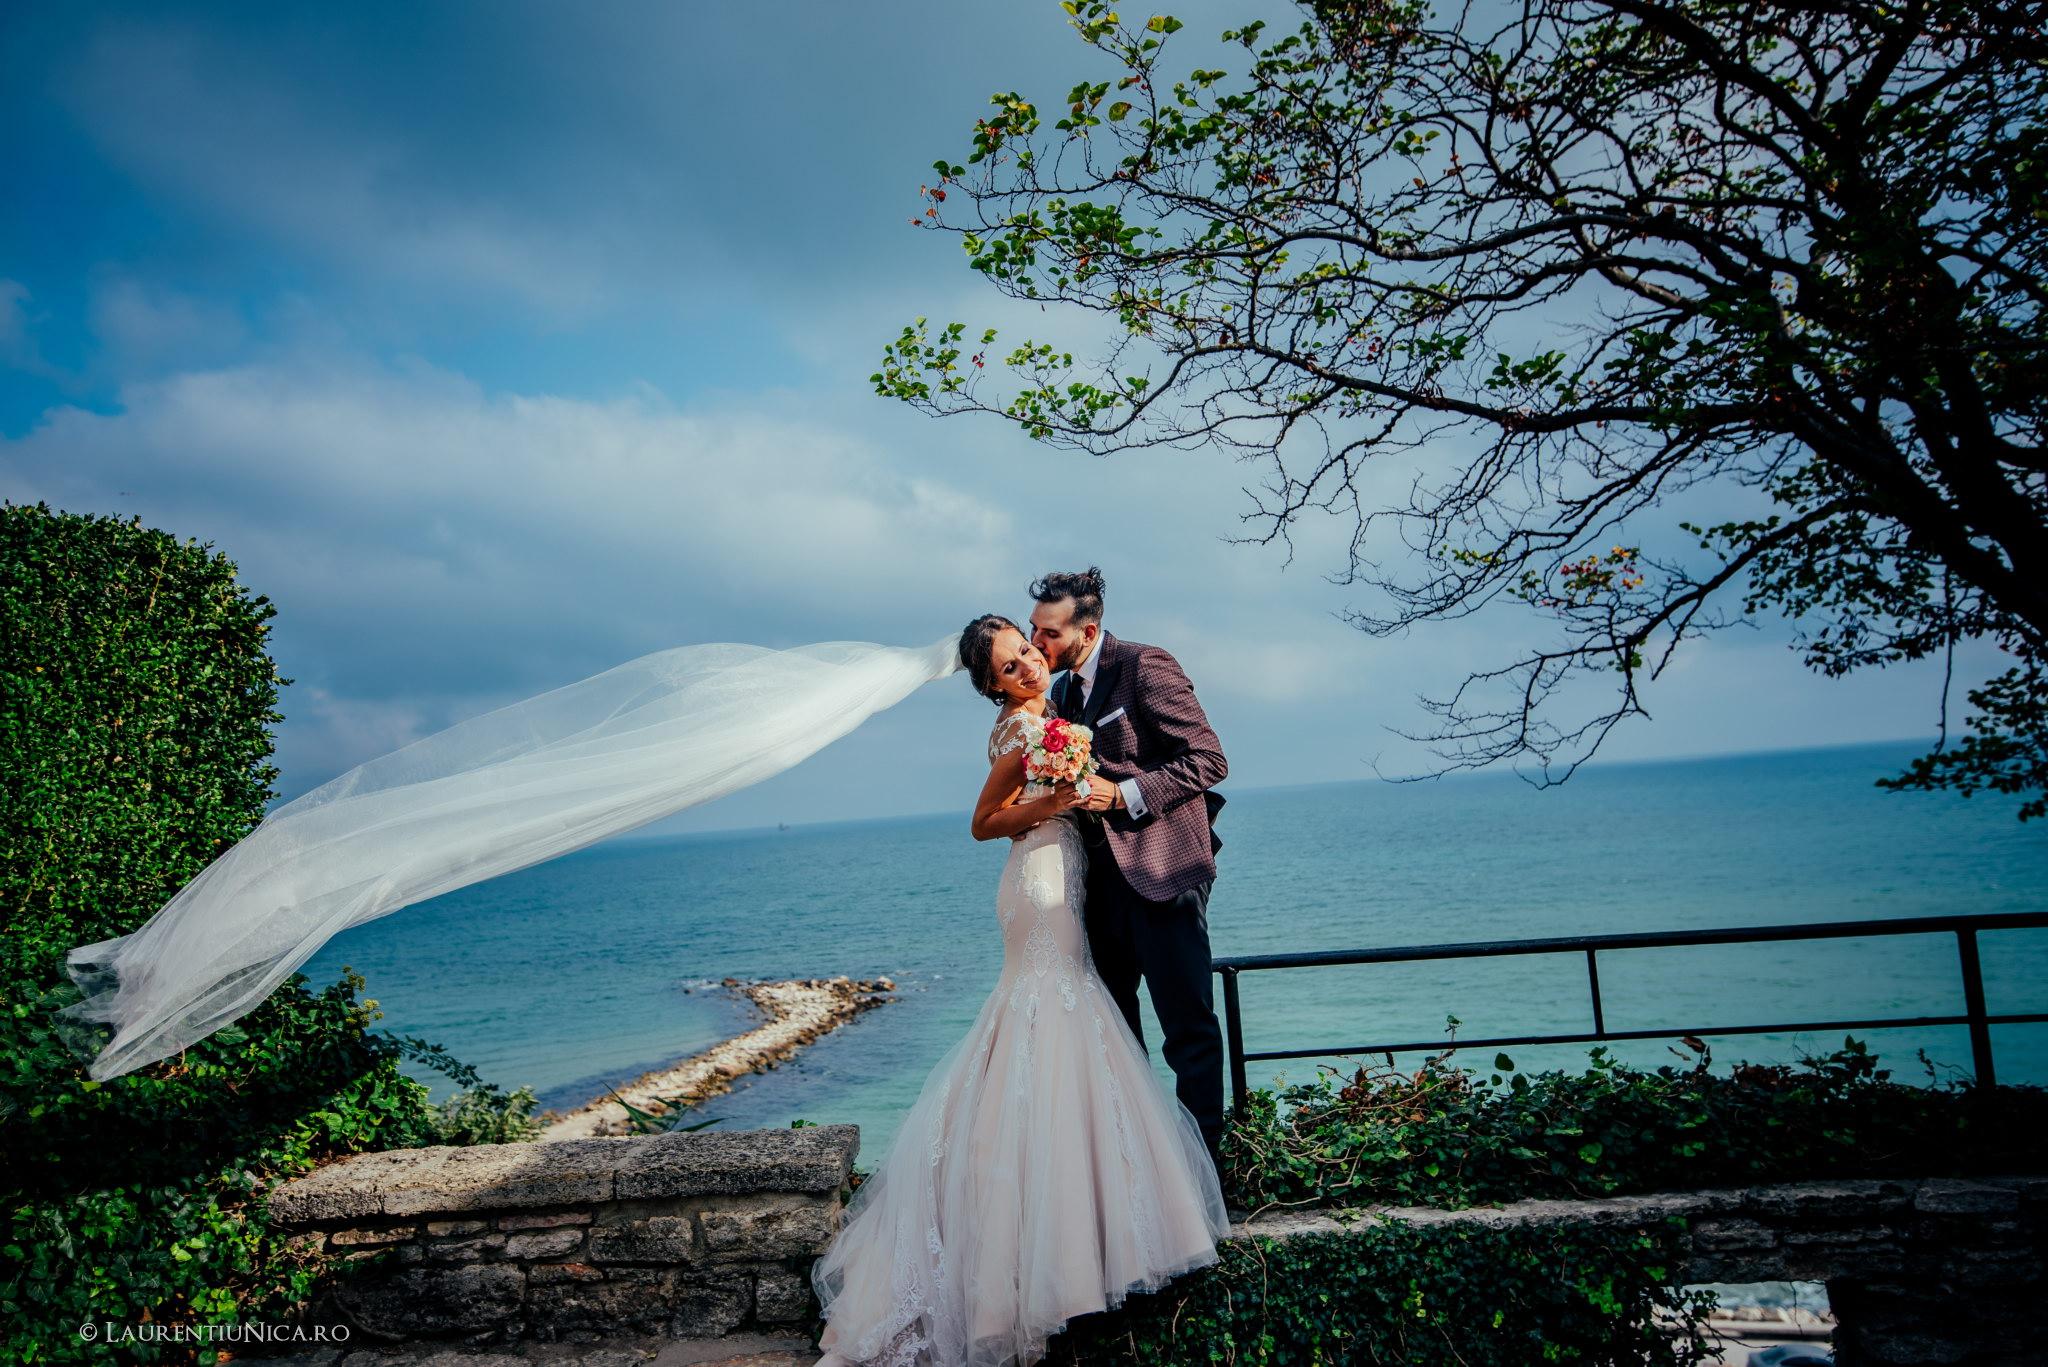 andreea si alin fotografii after wedding balchik bulgaria22 - Andreea & Alin | Fotografii After Wedding | Balchik Bulgaria